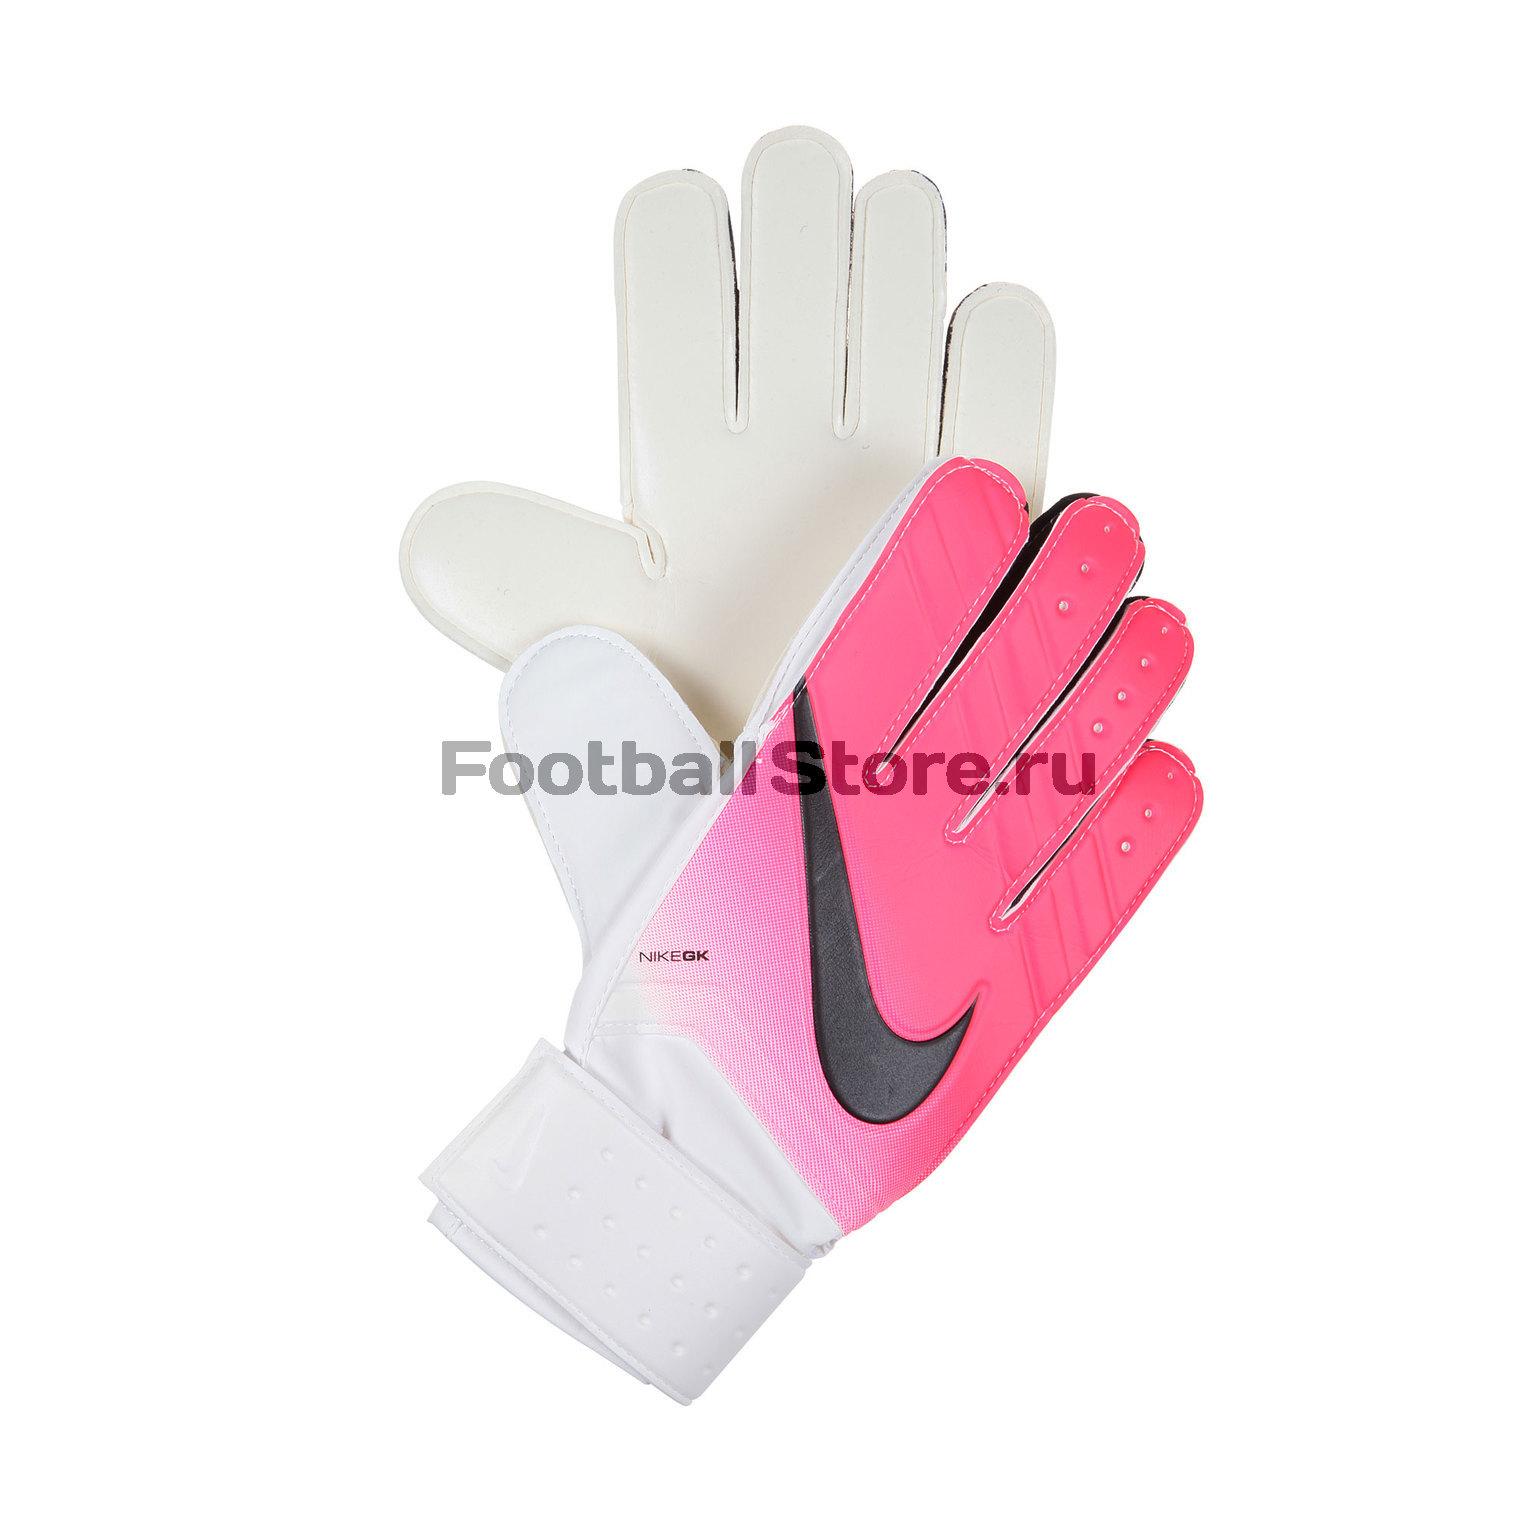 Перчатки вратарские Nike GK Match FA16 GS0330-185 механический карандаш rotring tikky ii